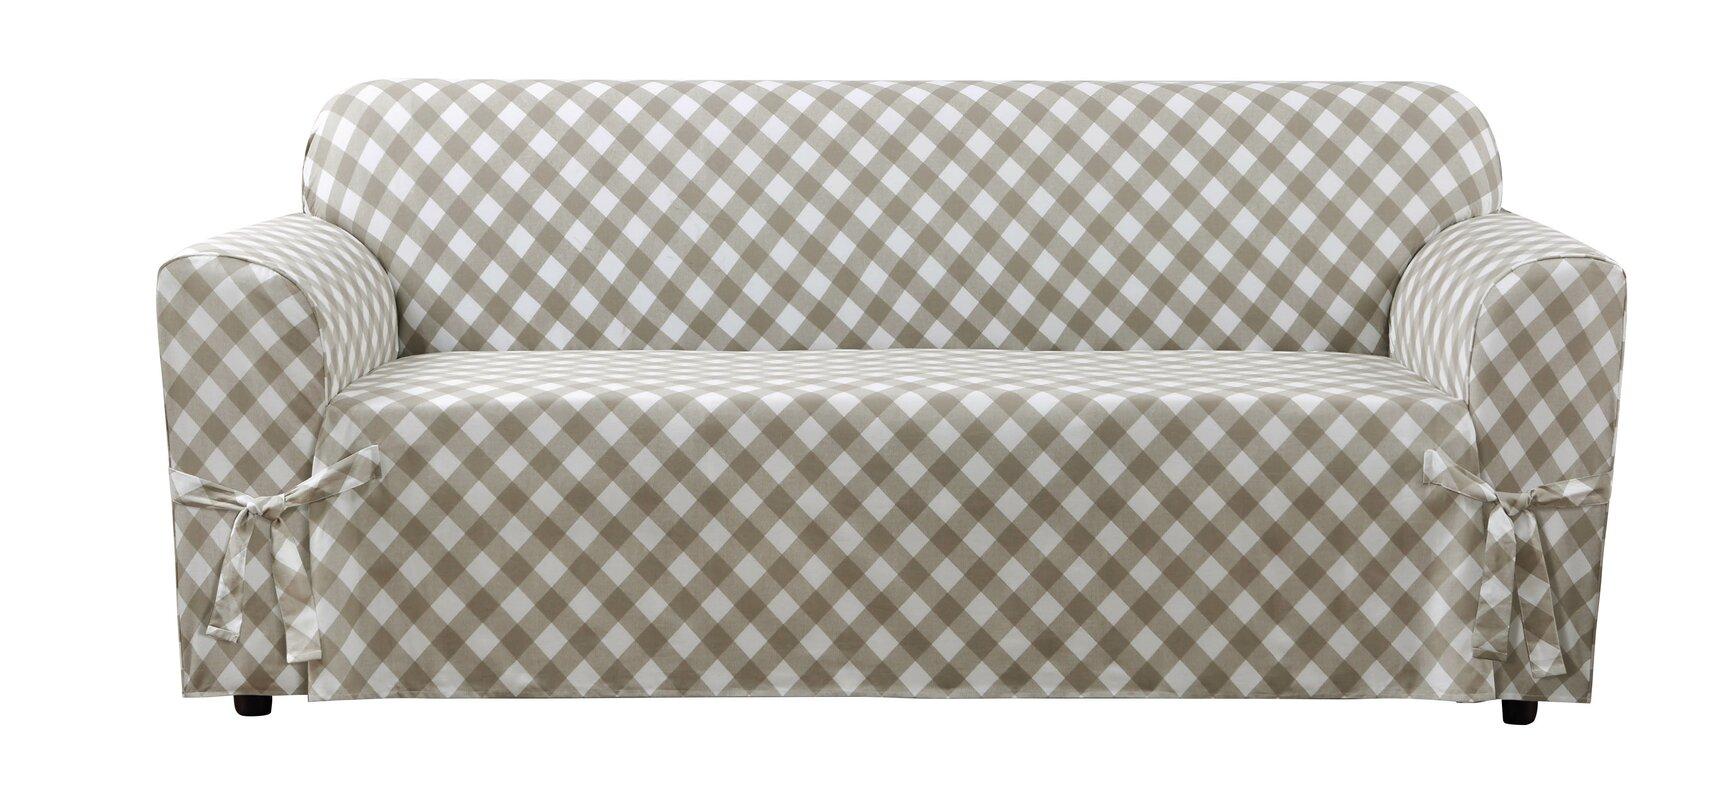 Sure Fit Buffalo Check Box Cushion Sofa Slipcover Reviews Wayfair ~ White Linen Sofa Slipcover